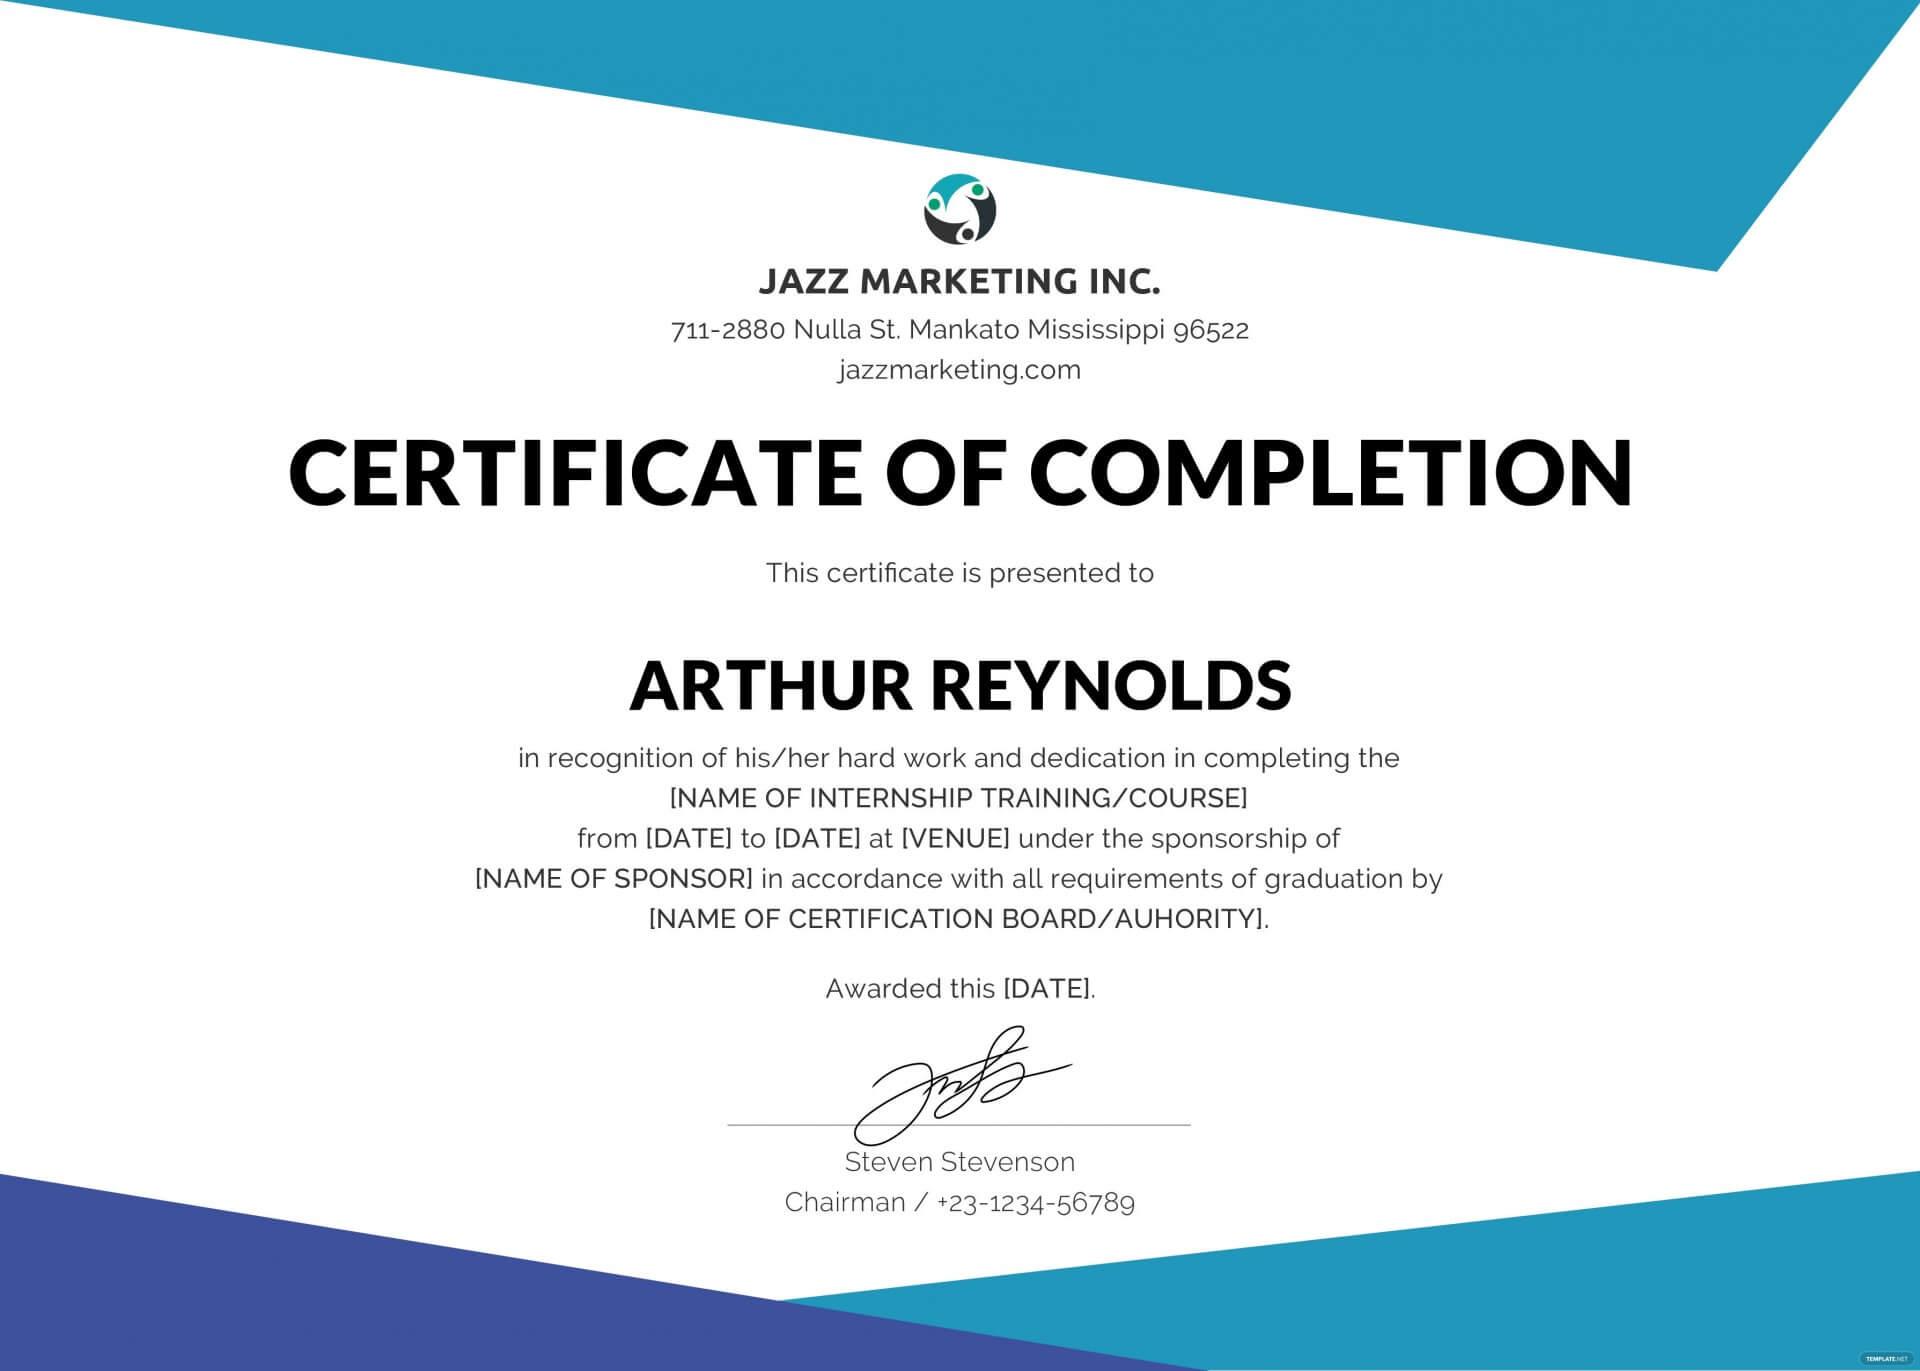 013 Forklift Truck Training Certificate Template Free Course Within Forklift Certification Template